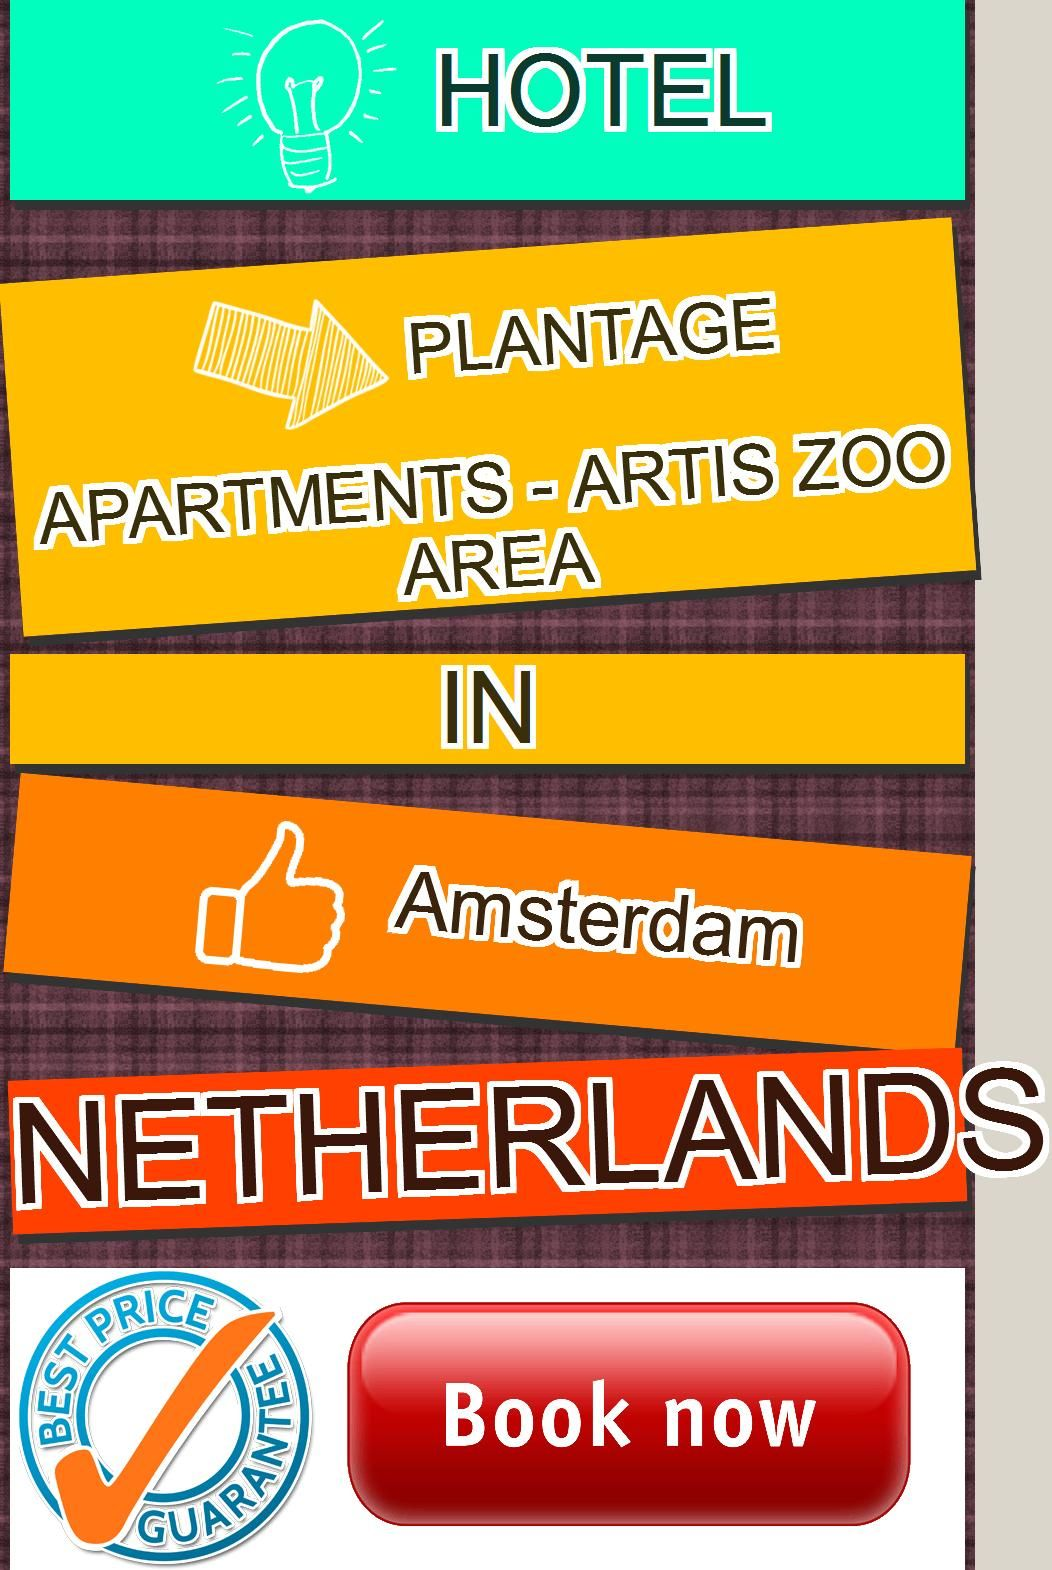 Plantage Apartments - Artis Zoo area in Amsterdam ...